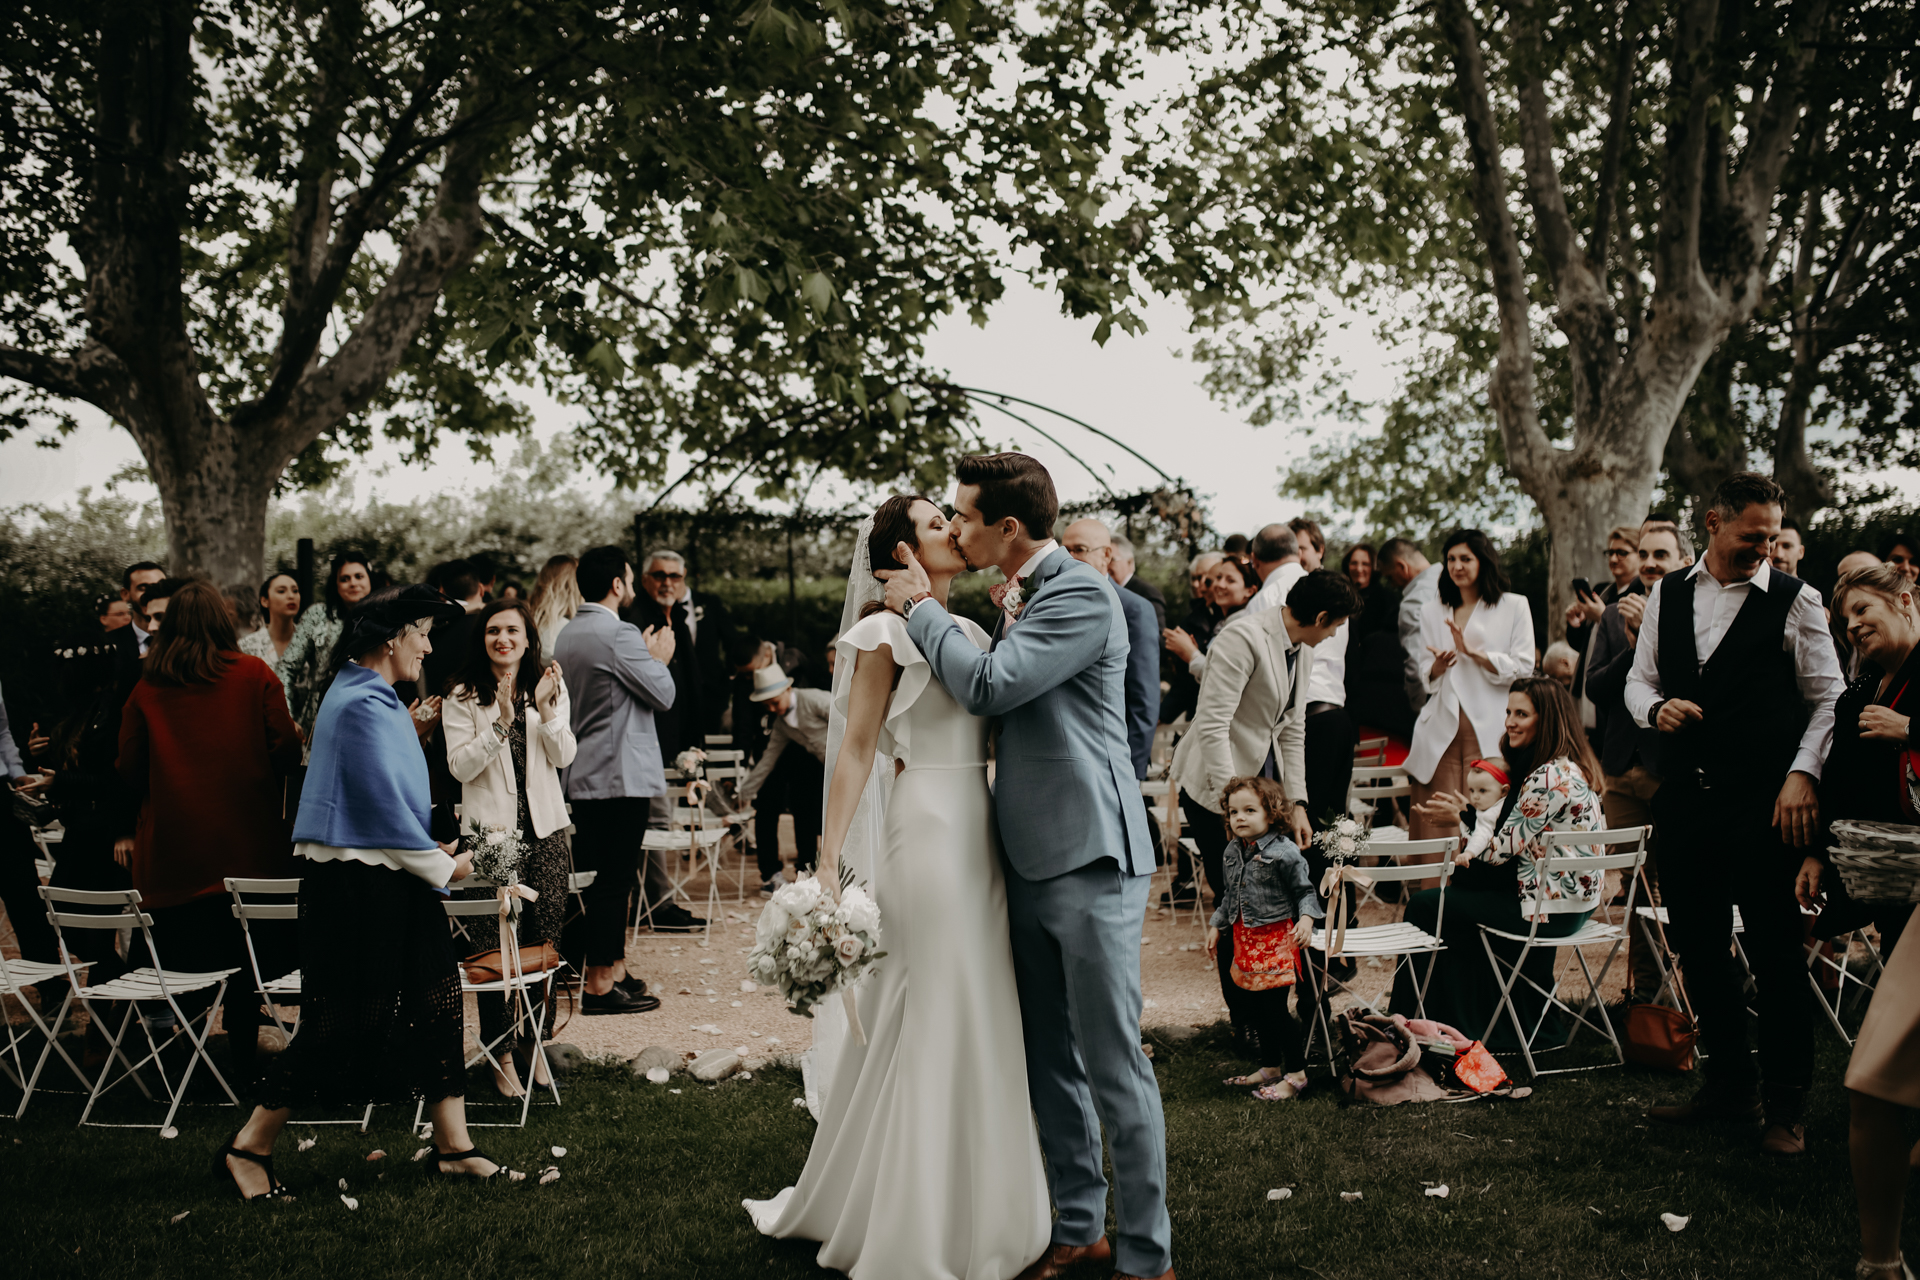 creation-maries-mariage-wedding-couple-parc-sourire-creation-ceremonie-chateau-provence-13-lieu-reception